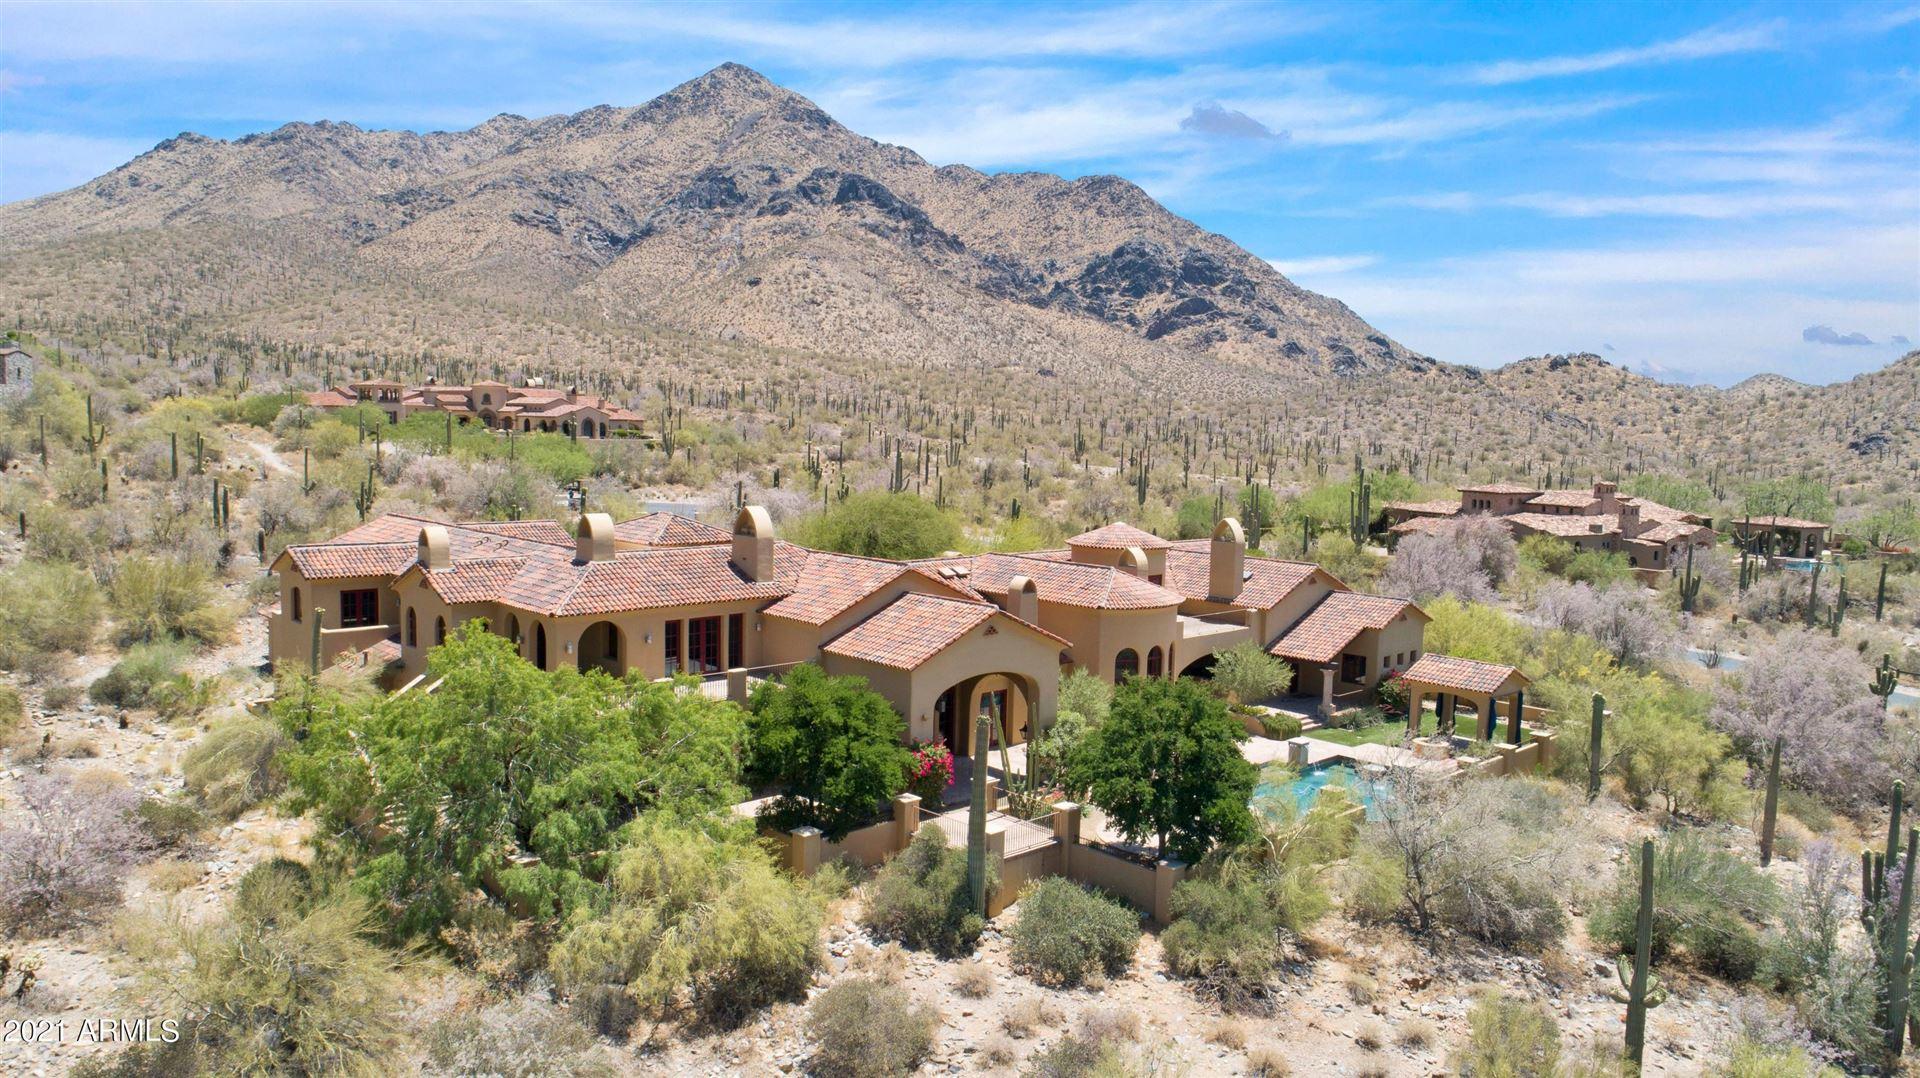 Photo of 11134 E SAGUARO CANYON Trail, Scottsdale, AZ 85255 (MLS # 6240602)